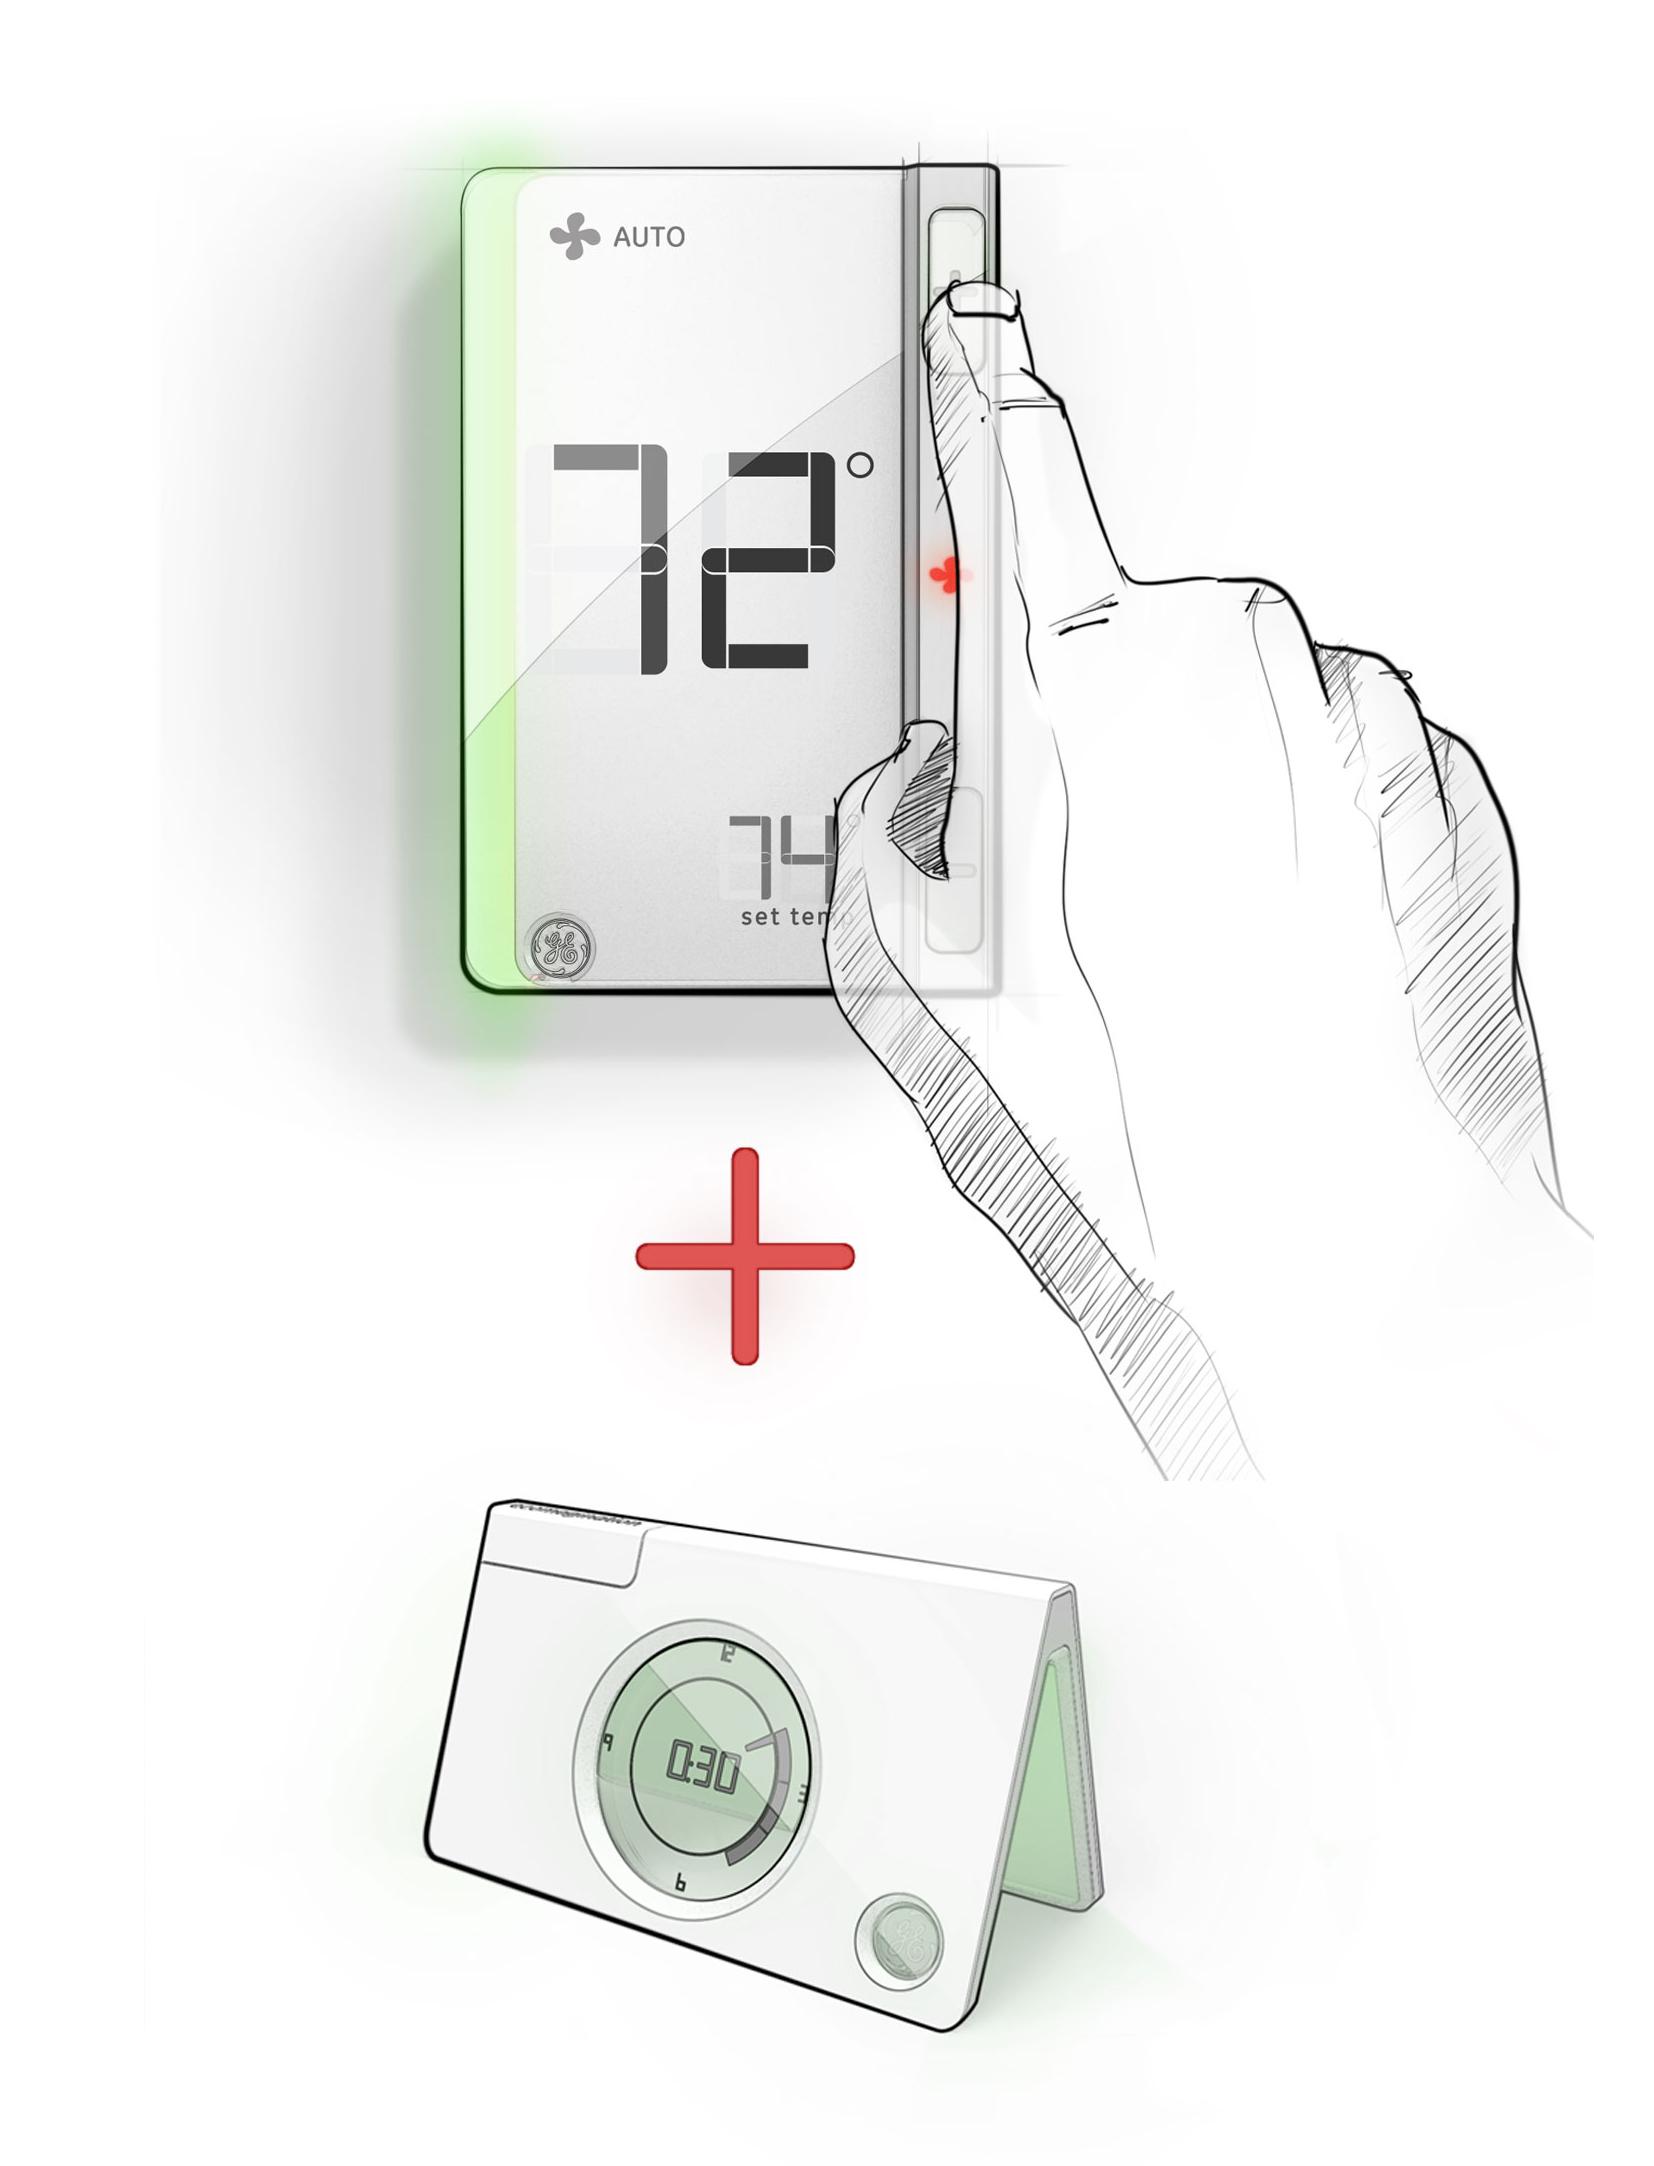 Reimagining-the-Thermostat-2.jpg